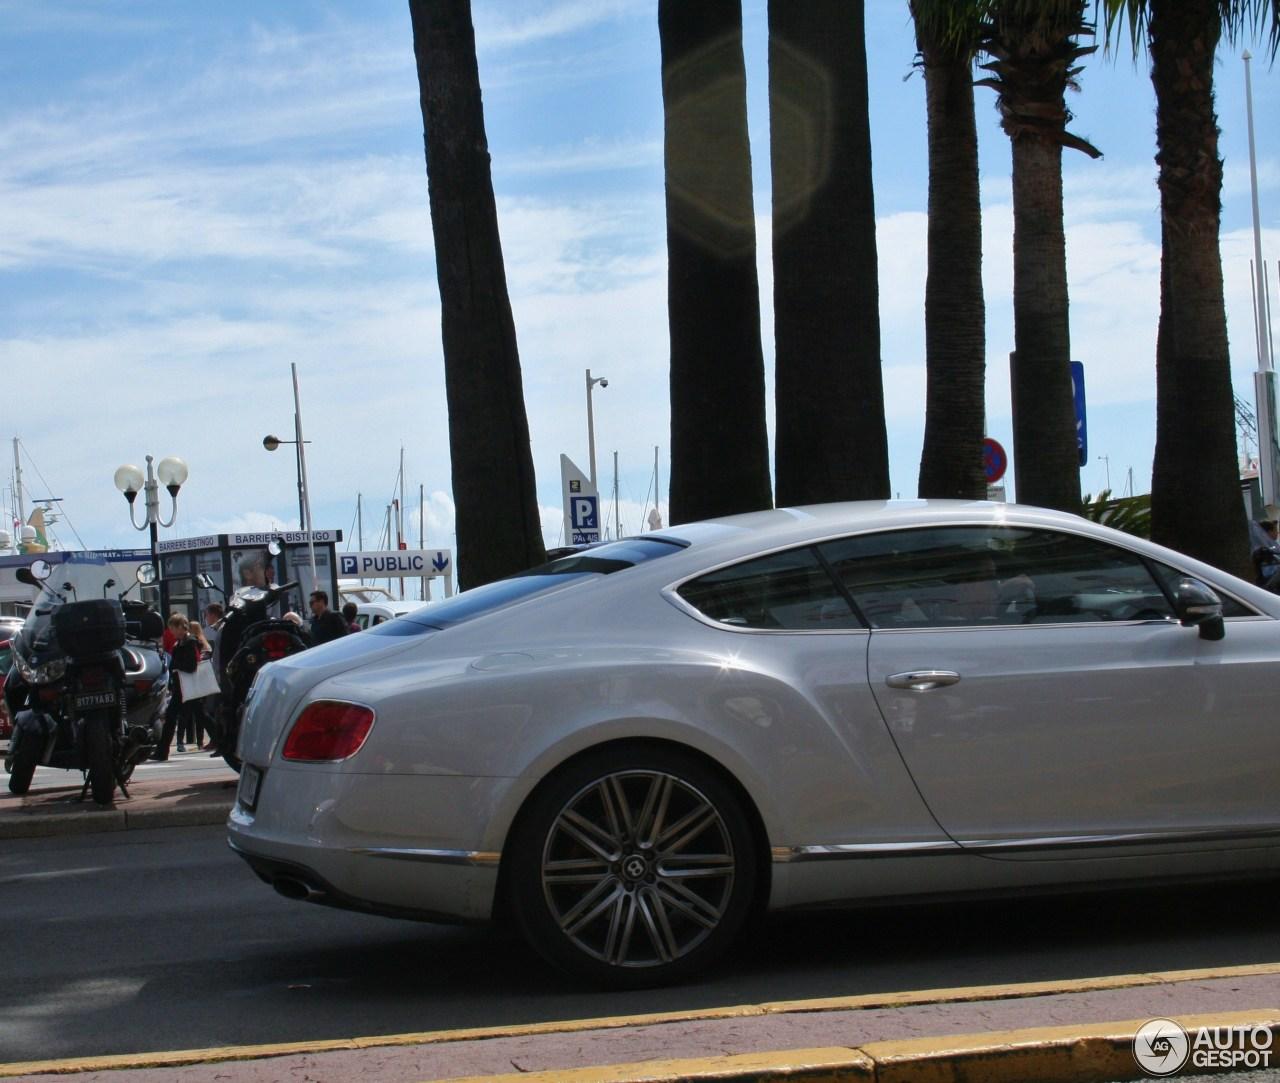 2013 Bentley Continental Gt Speed Convertible: Bentley Continental GT Speed 2012